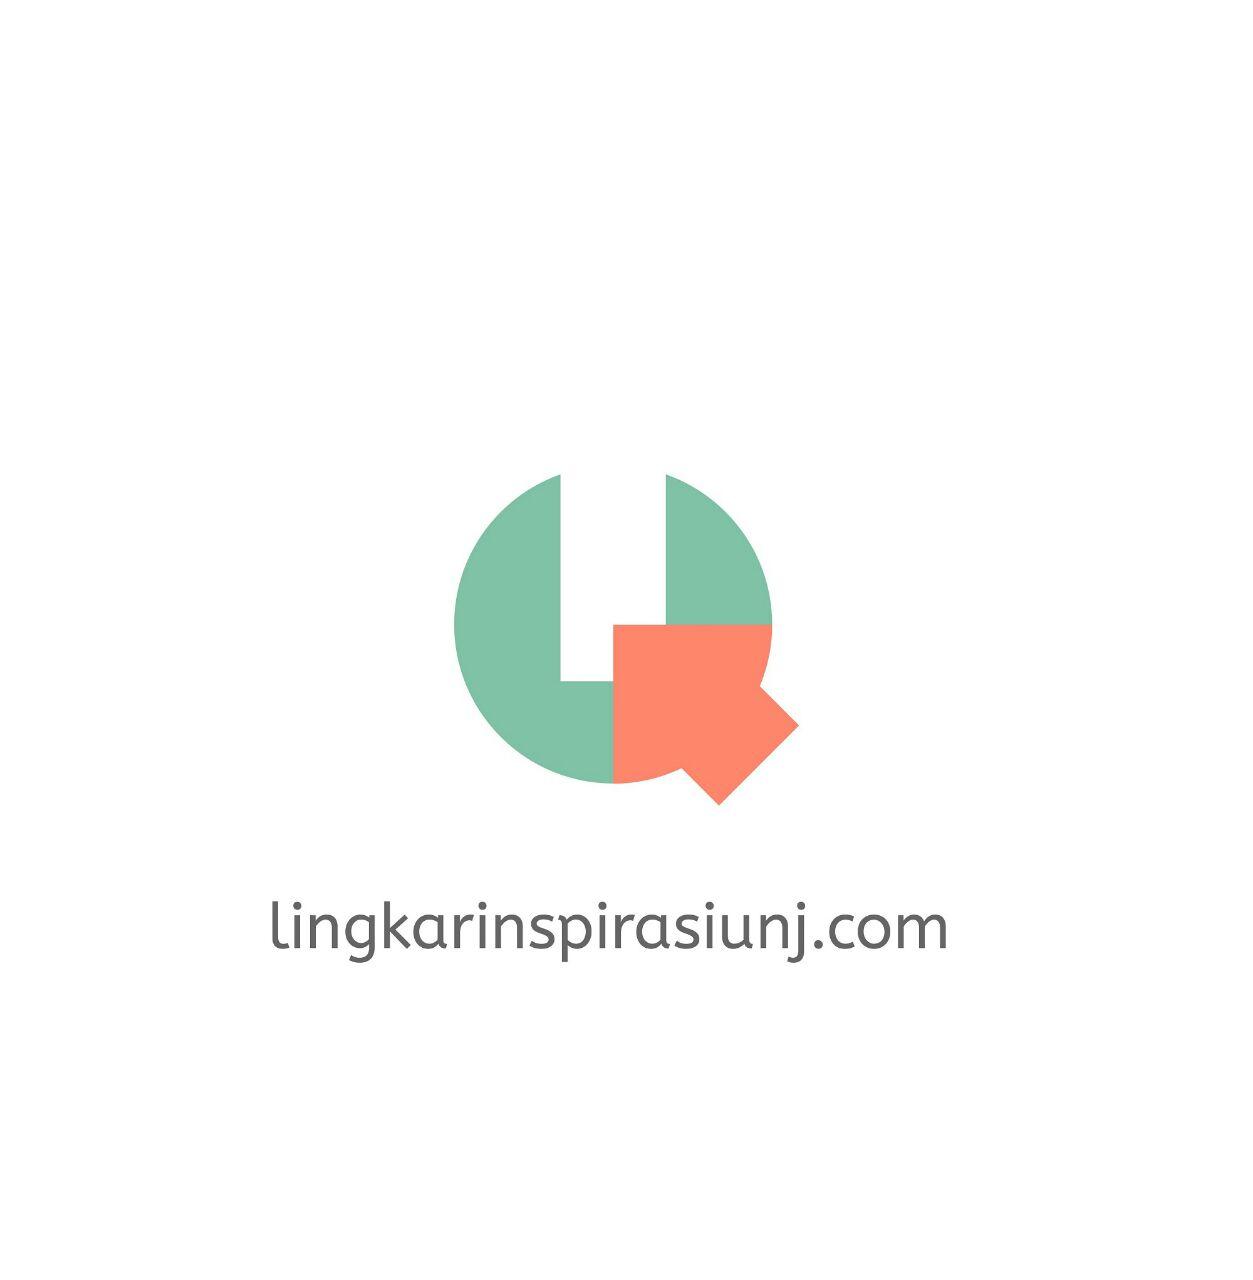 lingkarimspirasiunj.com